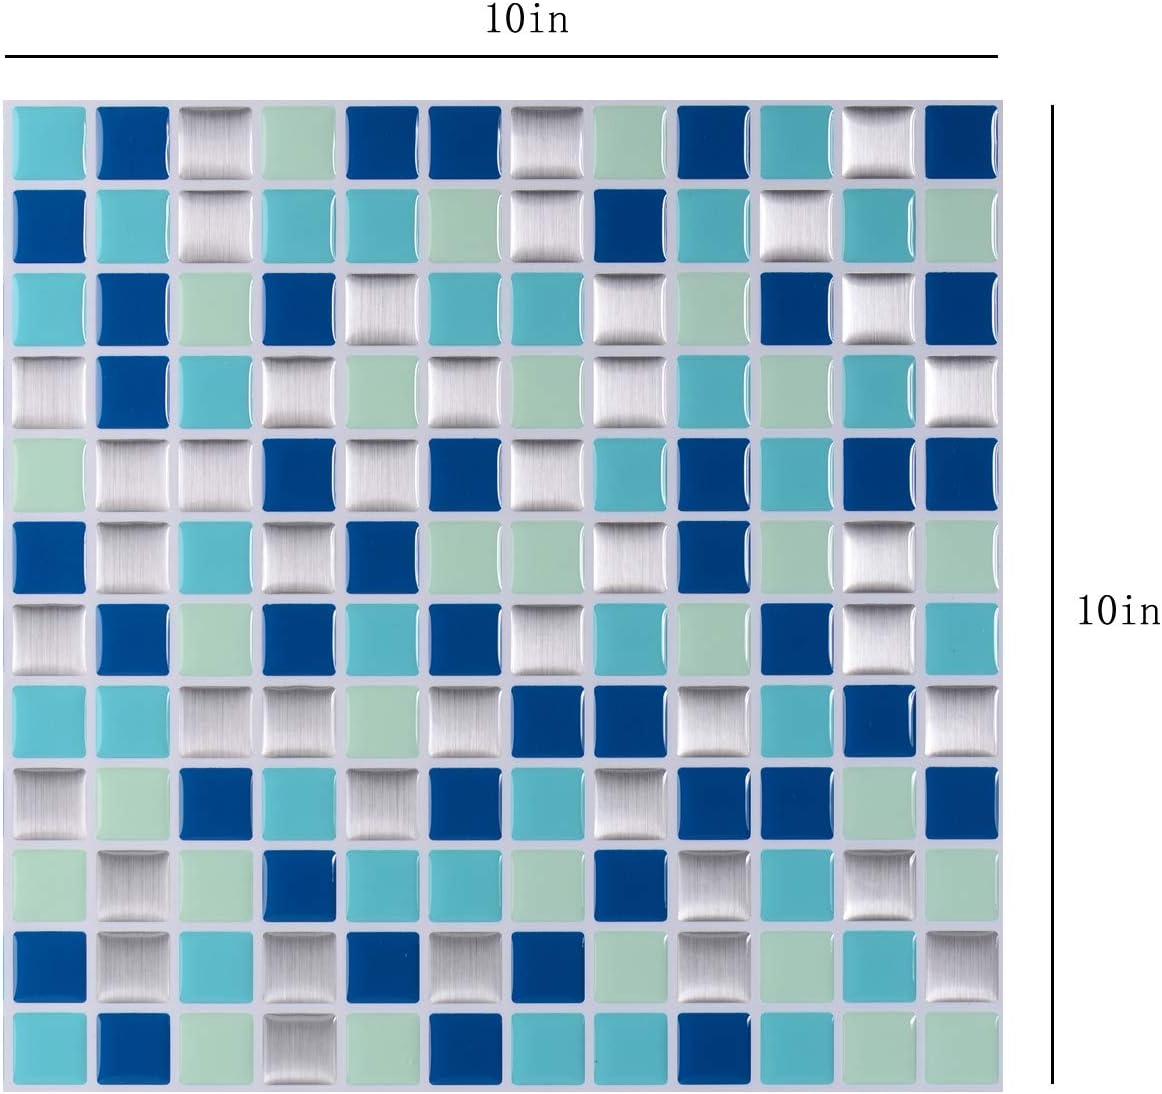 4 Sheets Self Adhesive Tile Stickers 10x 10 nanly Peel and Stick Tile Backsplash for Kitchen//Bath Black and White Mosaic Stick on Tiles Splashback